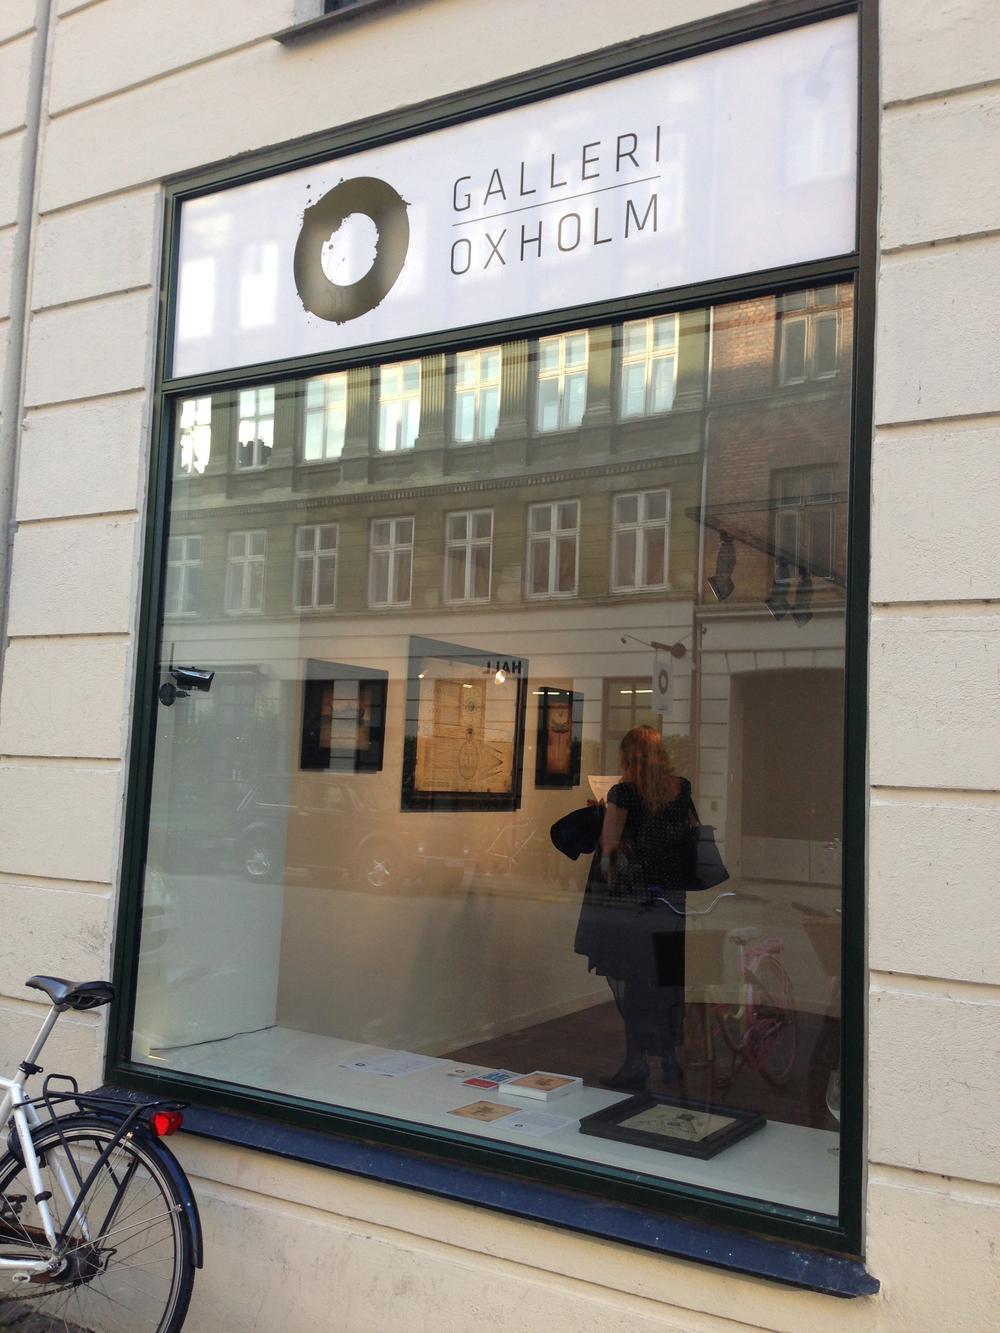 Oxholm Gallery HALL,  Ravnsborggade 6, 2200 Copenhagen N, Denmark                   Photo by Andreea Vlad